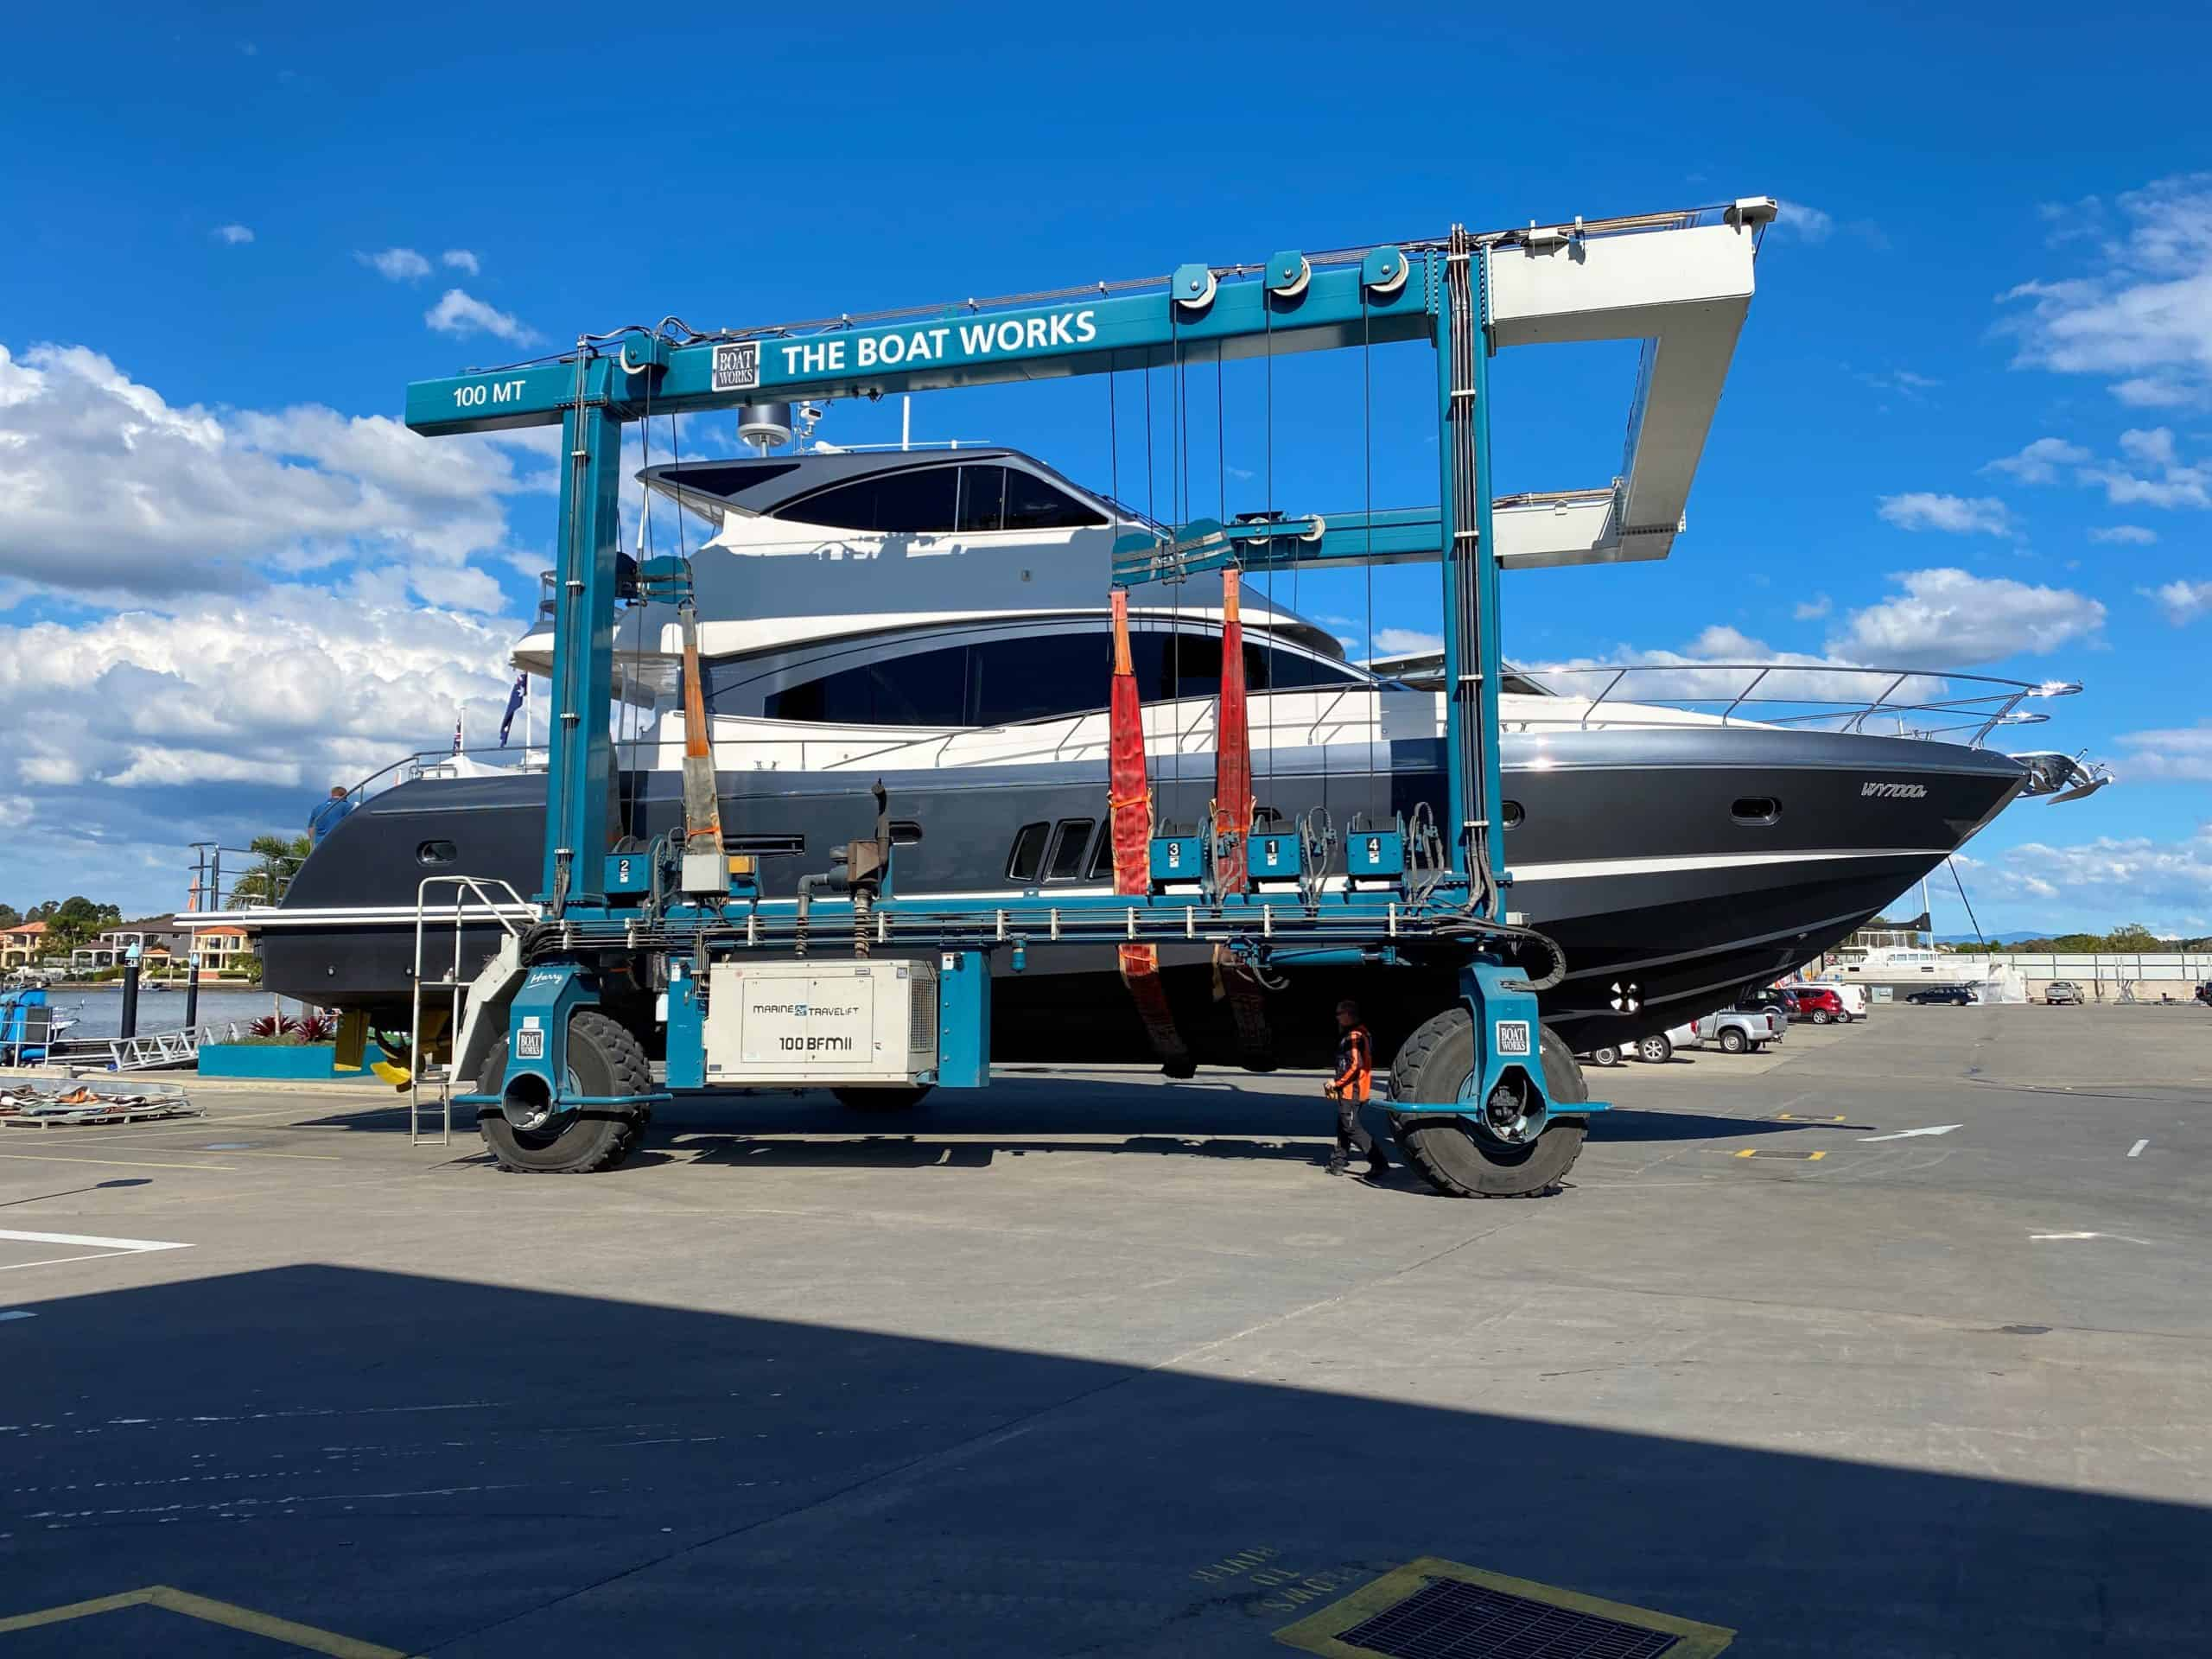 Whitehaven motor yacht undergoing maintenance